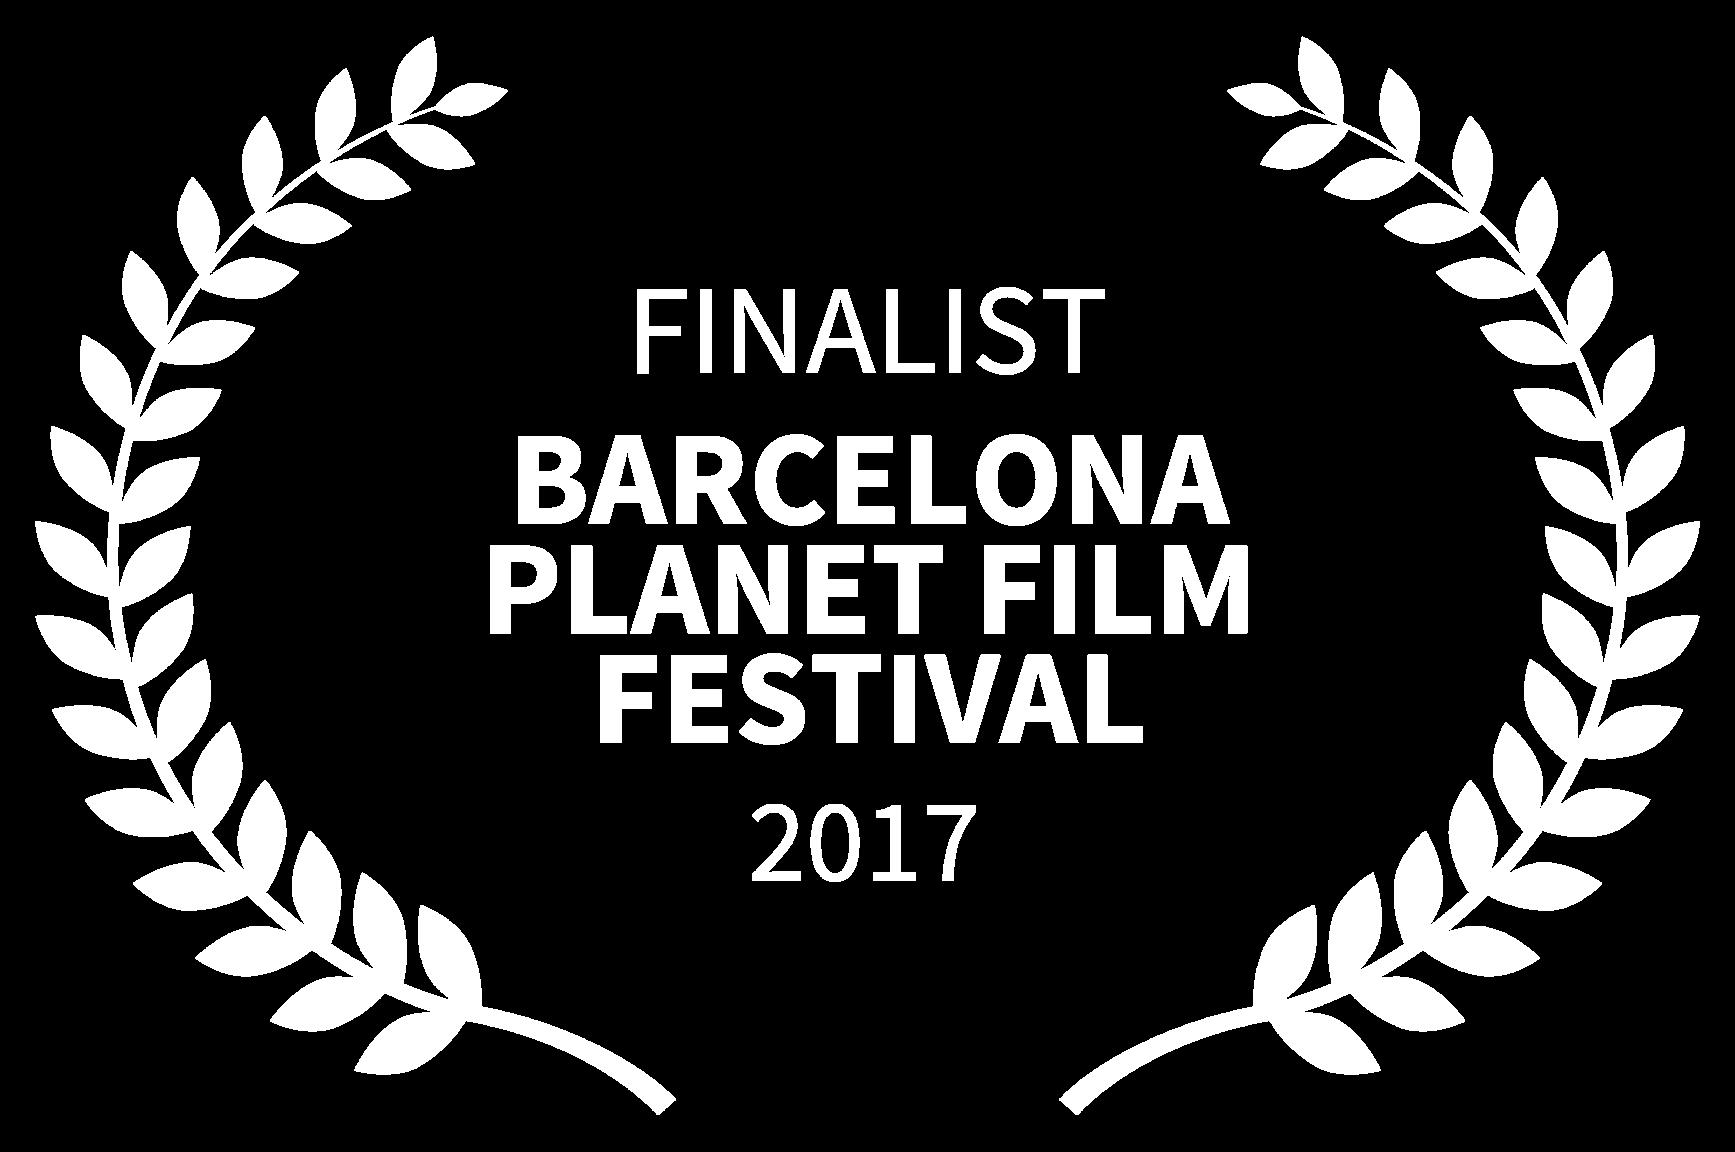 FINALIST - BARCELONA PLANET FILM FESTIVAL - 2018